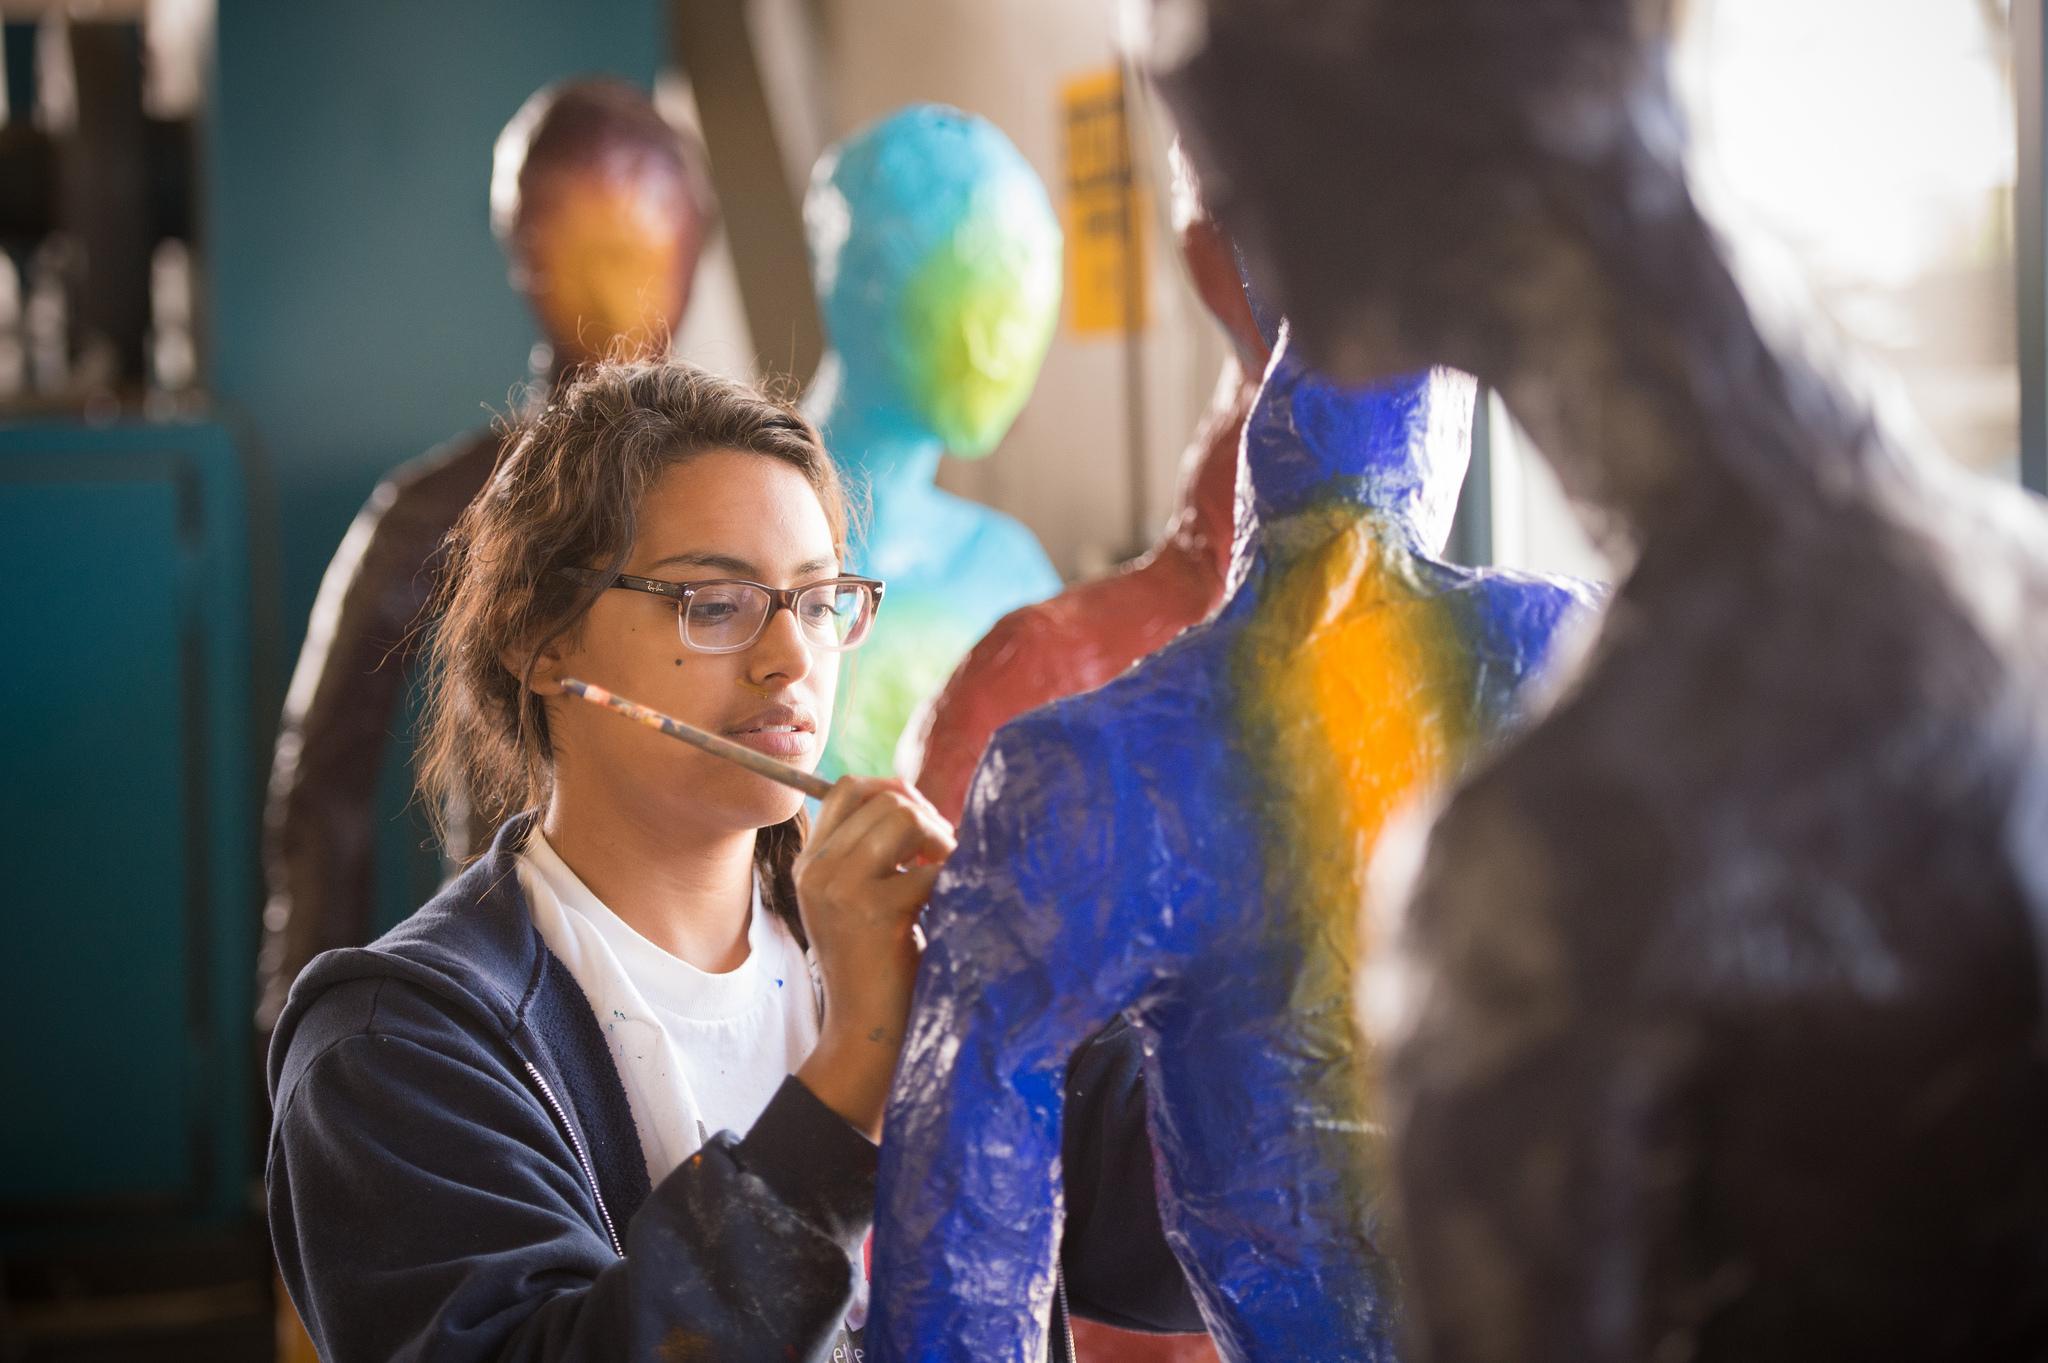 Art student working on capstone sculpture